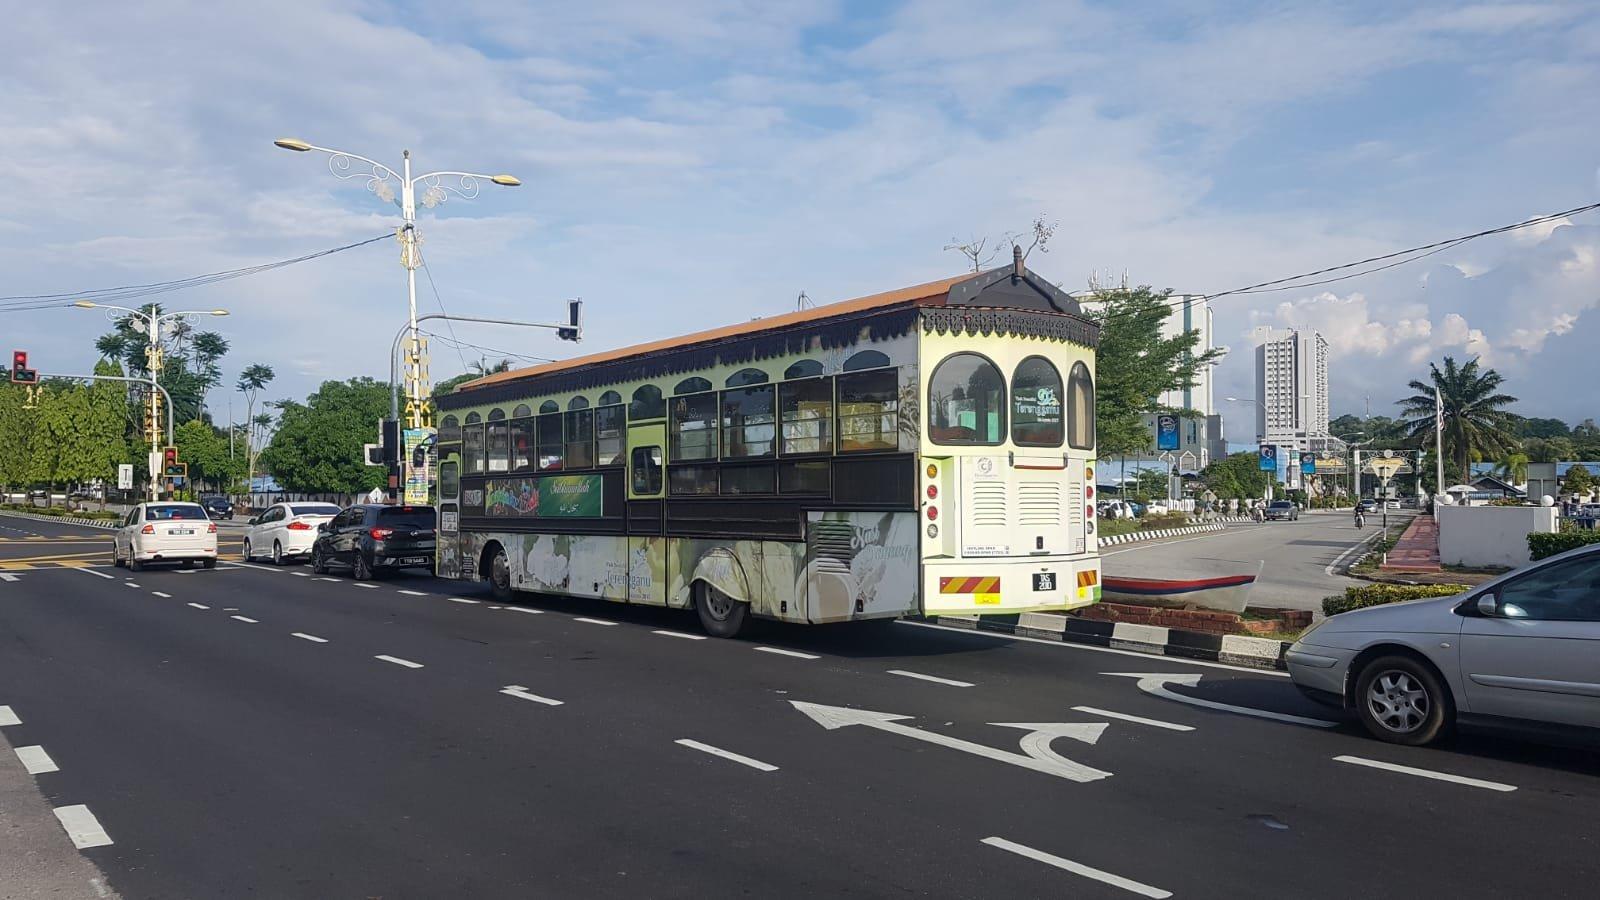 Bus in Kuala Terengganu